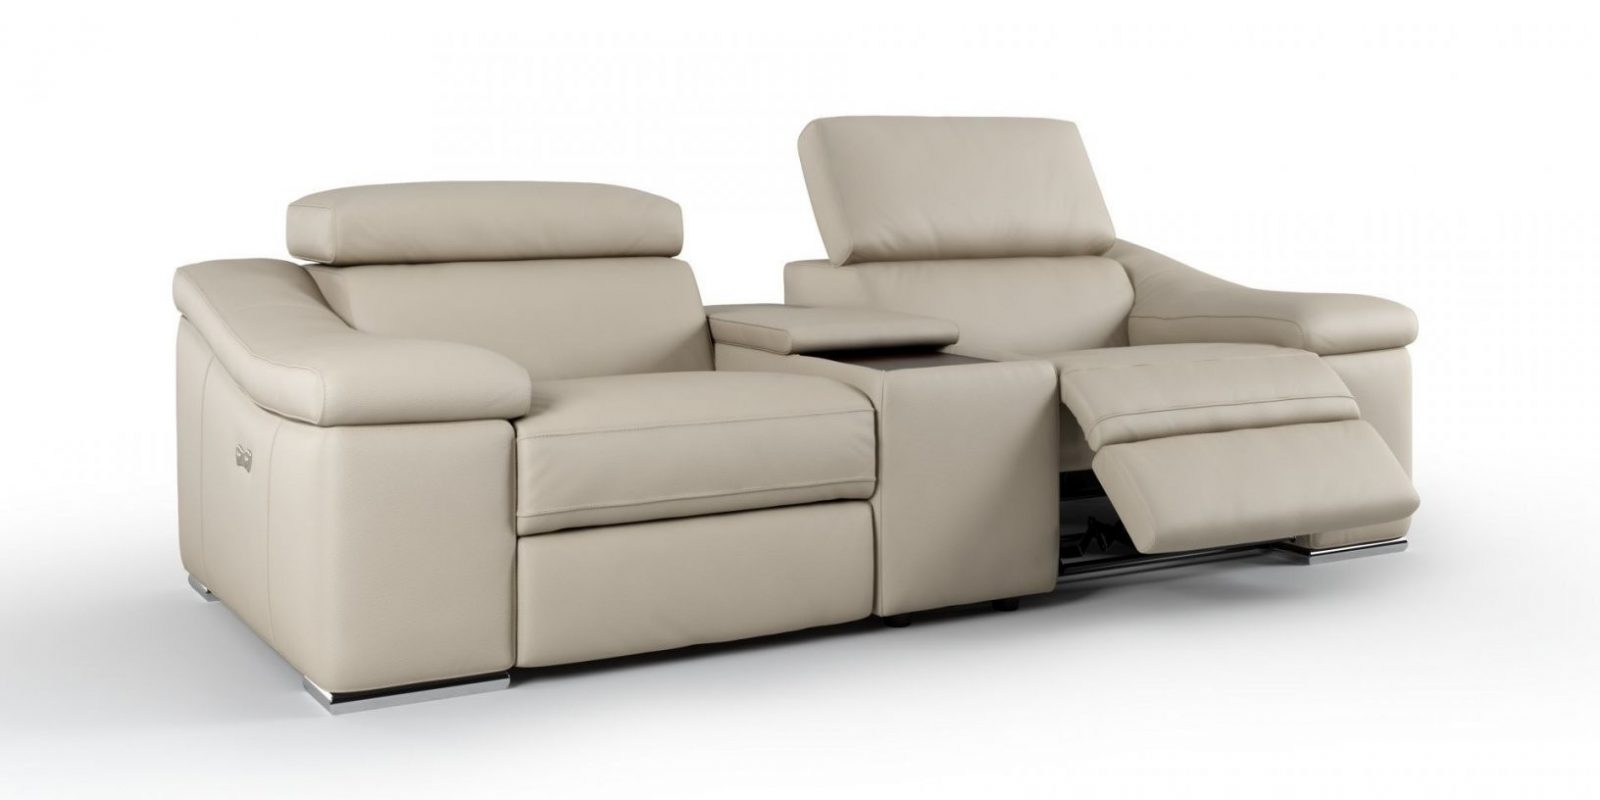 Kinocouch Grenada  Heimkino Couch Kaufen  Sofanella von Kino Sofa 2 Sitzer Photo